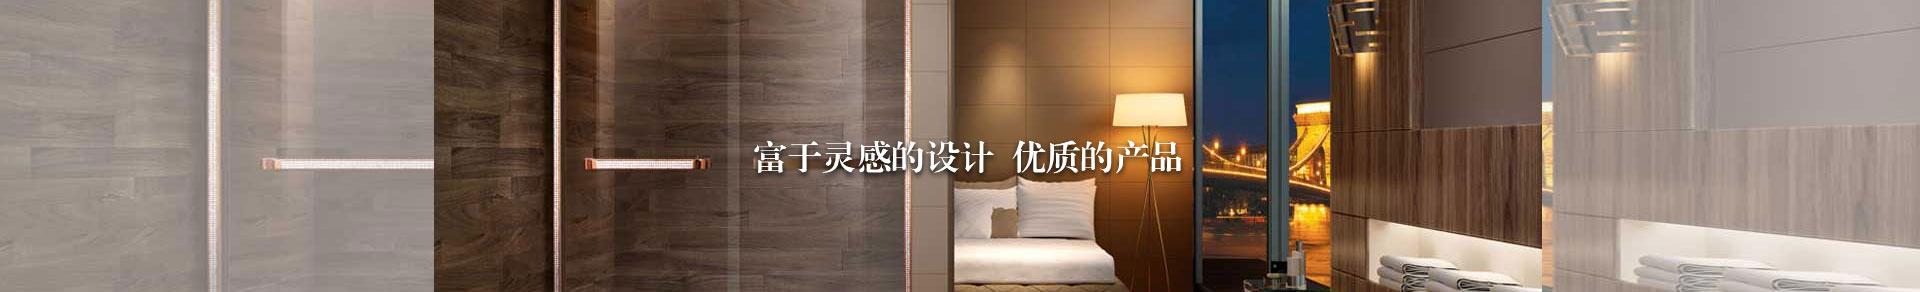 http://cn86-demo.oss-cn-hangzhou.aliyuncs.com/demo/4639ca70aa8mfd72.jpg